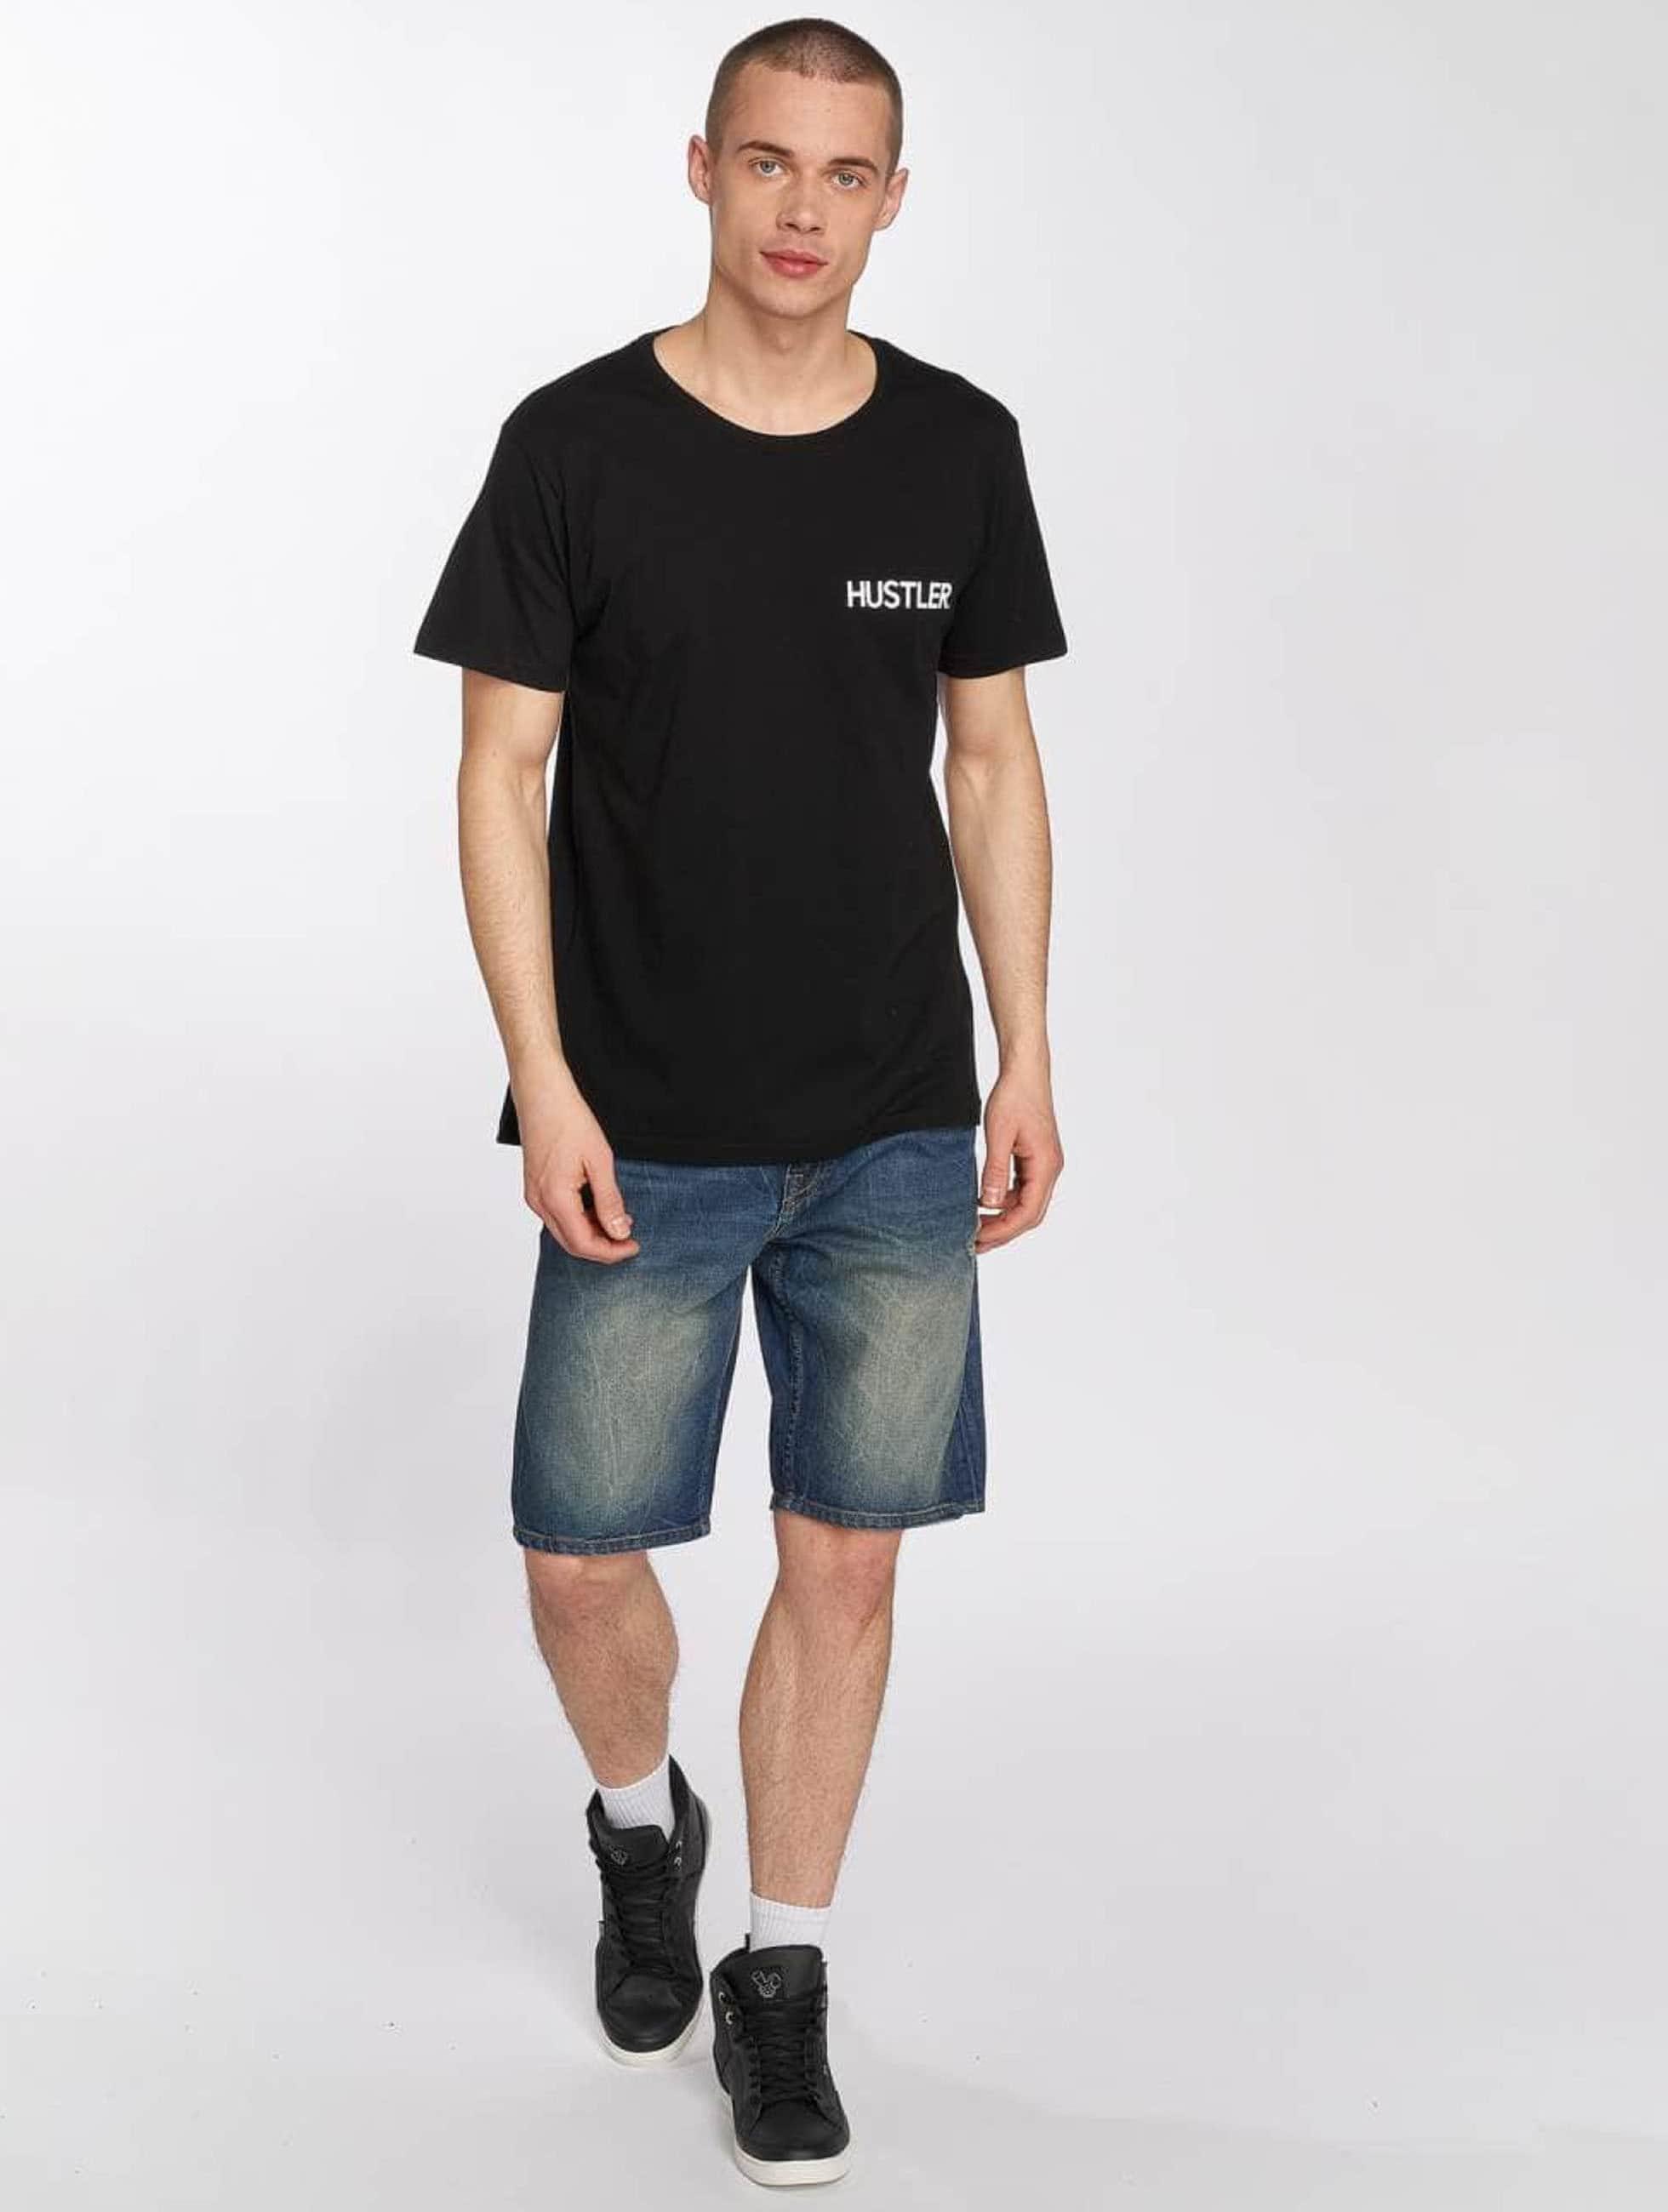 Merchcode T-Shirt Hustler Afterparty black